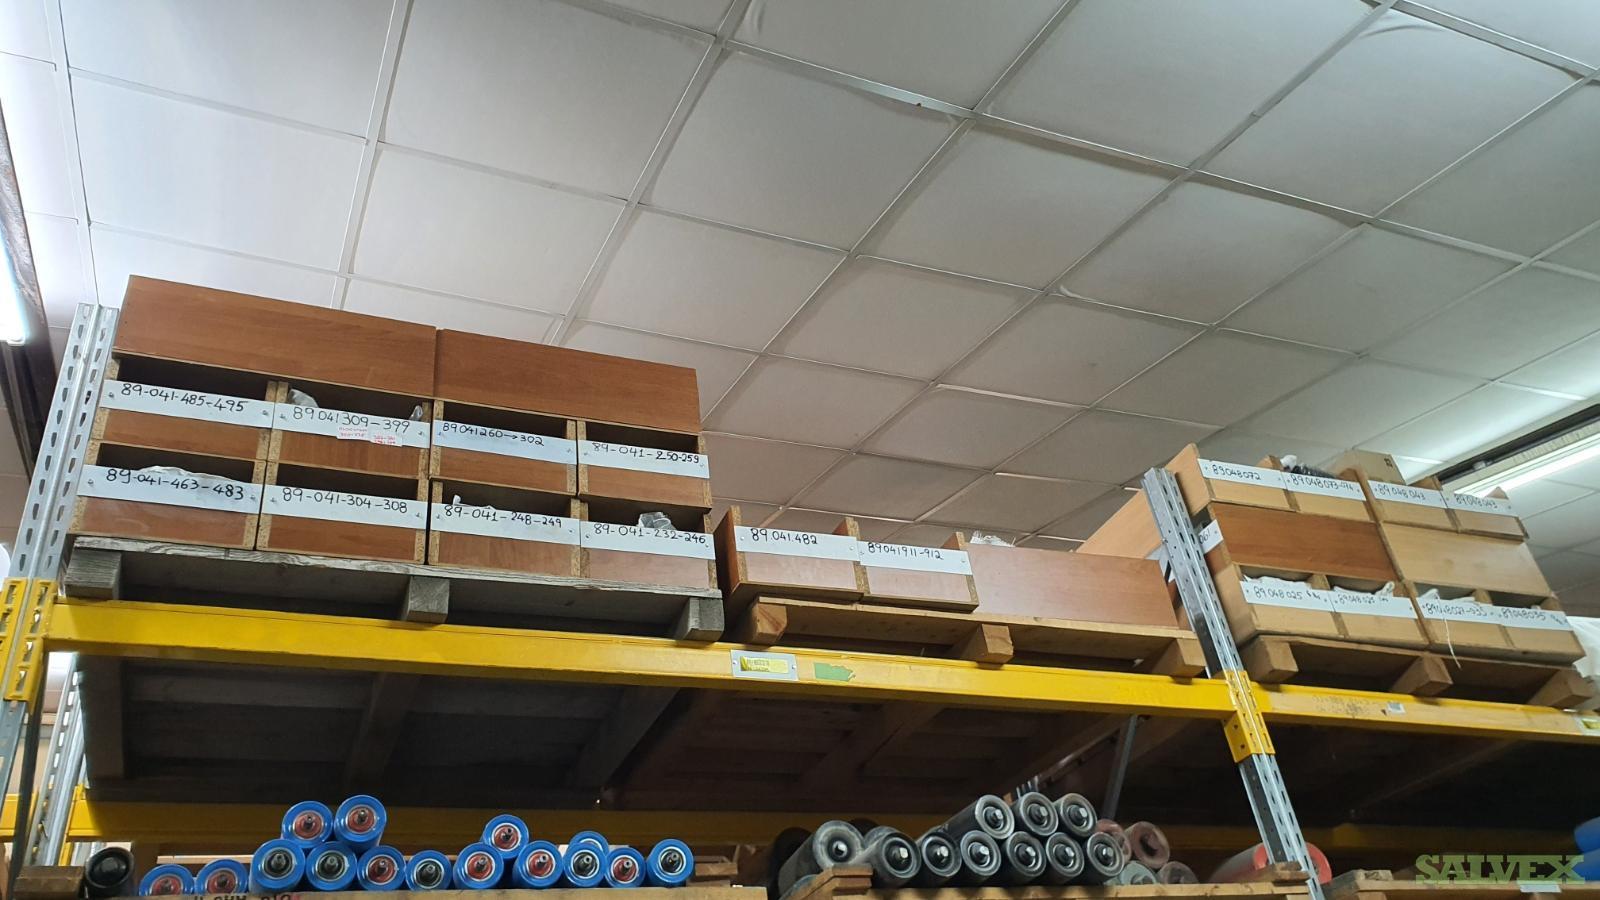 Hyundai Diesel Power Generator - Spare Parts: 4X1.5MW Himsen 8H21.32 (Package of 402 Items)